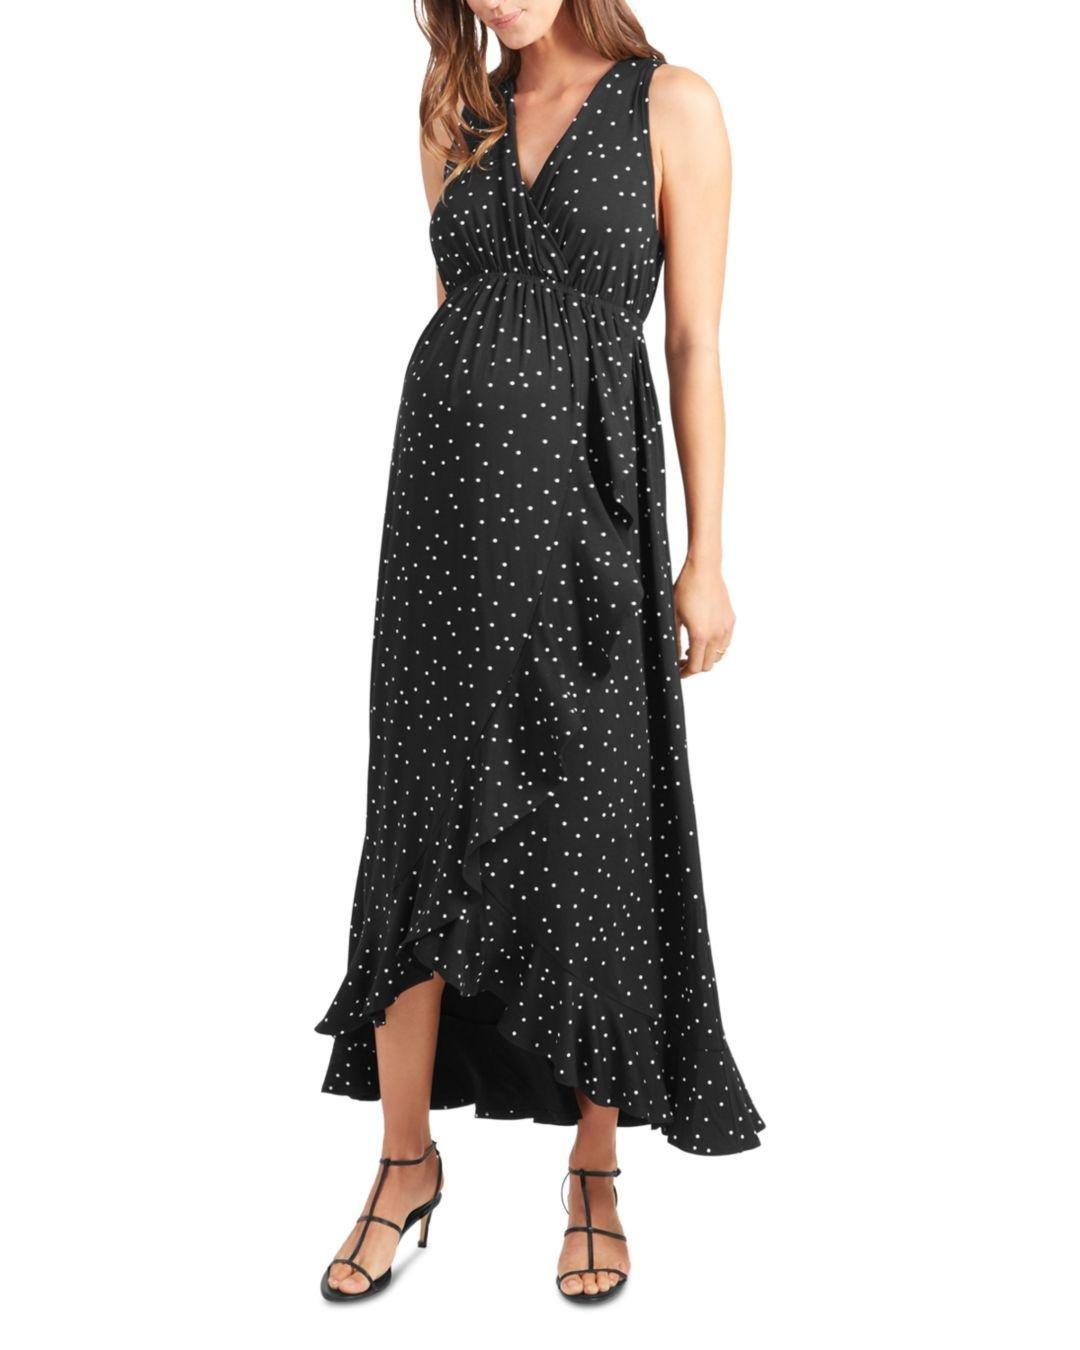 c7e5ea016f4c Lyst - Ingrid & Isabel Maternity Racerback Ruffle Maxi Dress in Black